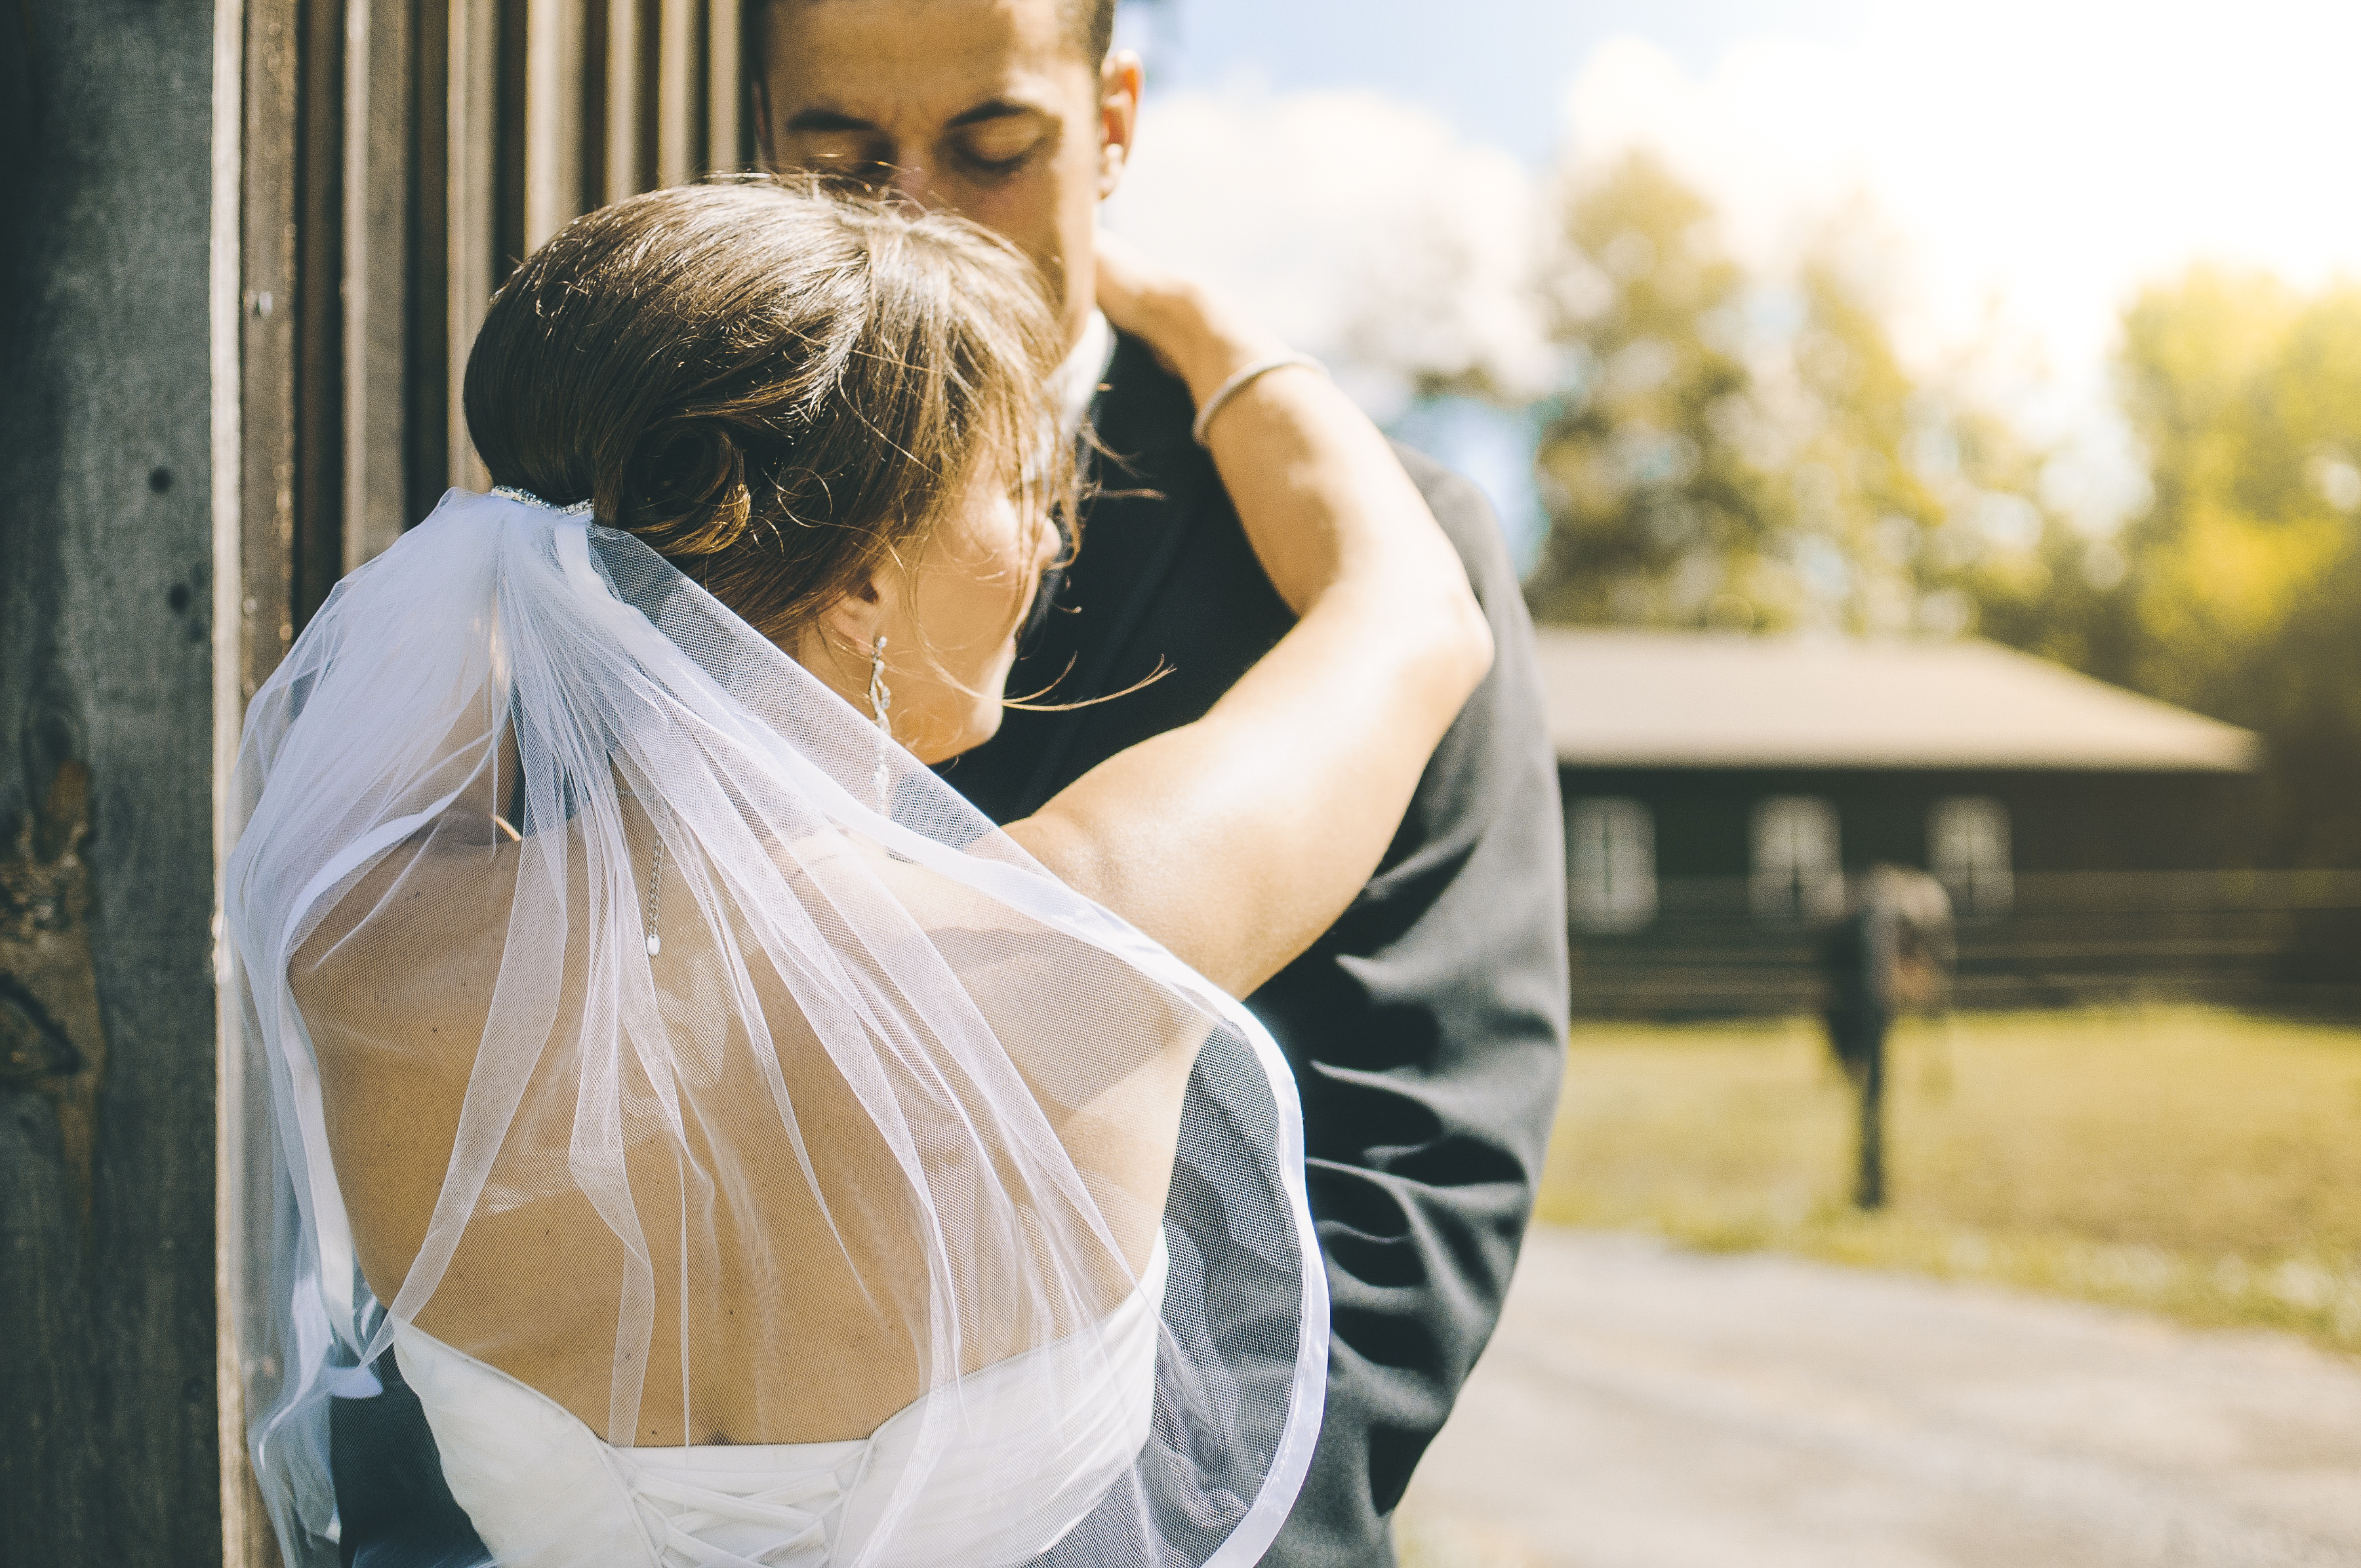 https://sleeklens.com/wp-content/uploads/2018/09/wedding-lightroom-presets-signature-bride-groom-after-1.jpg